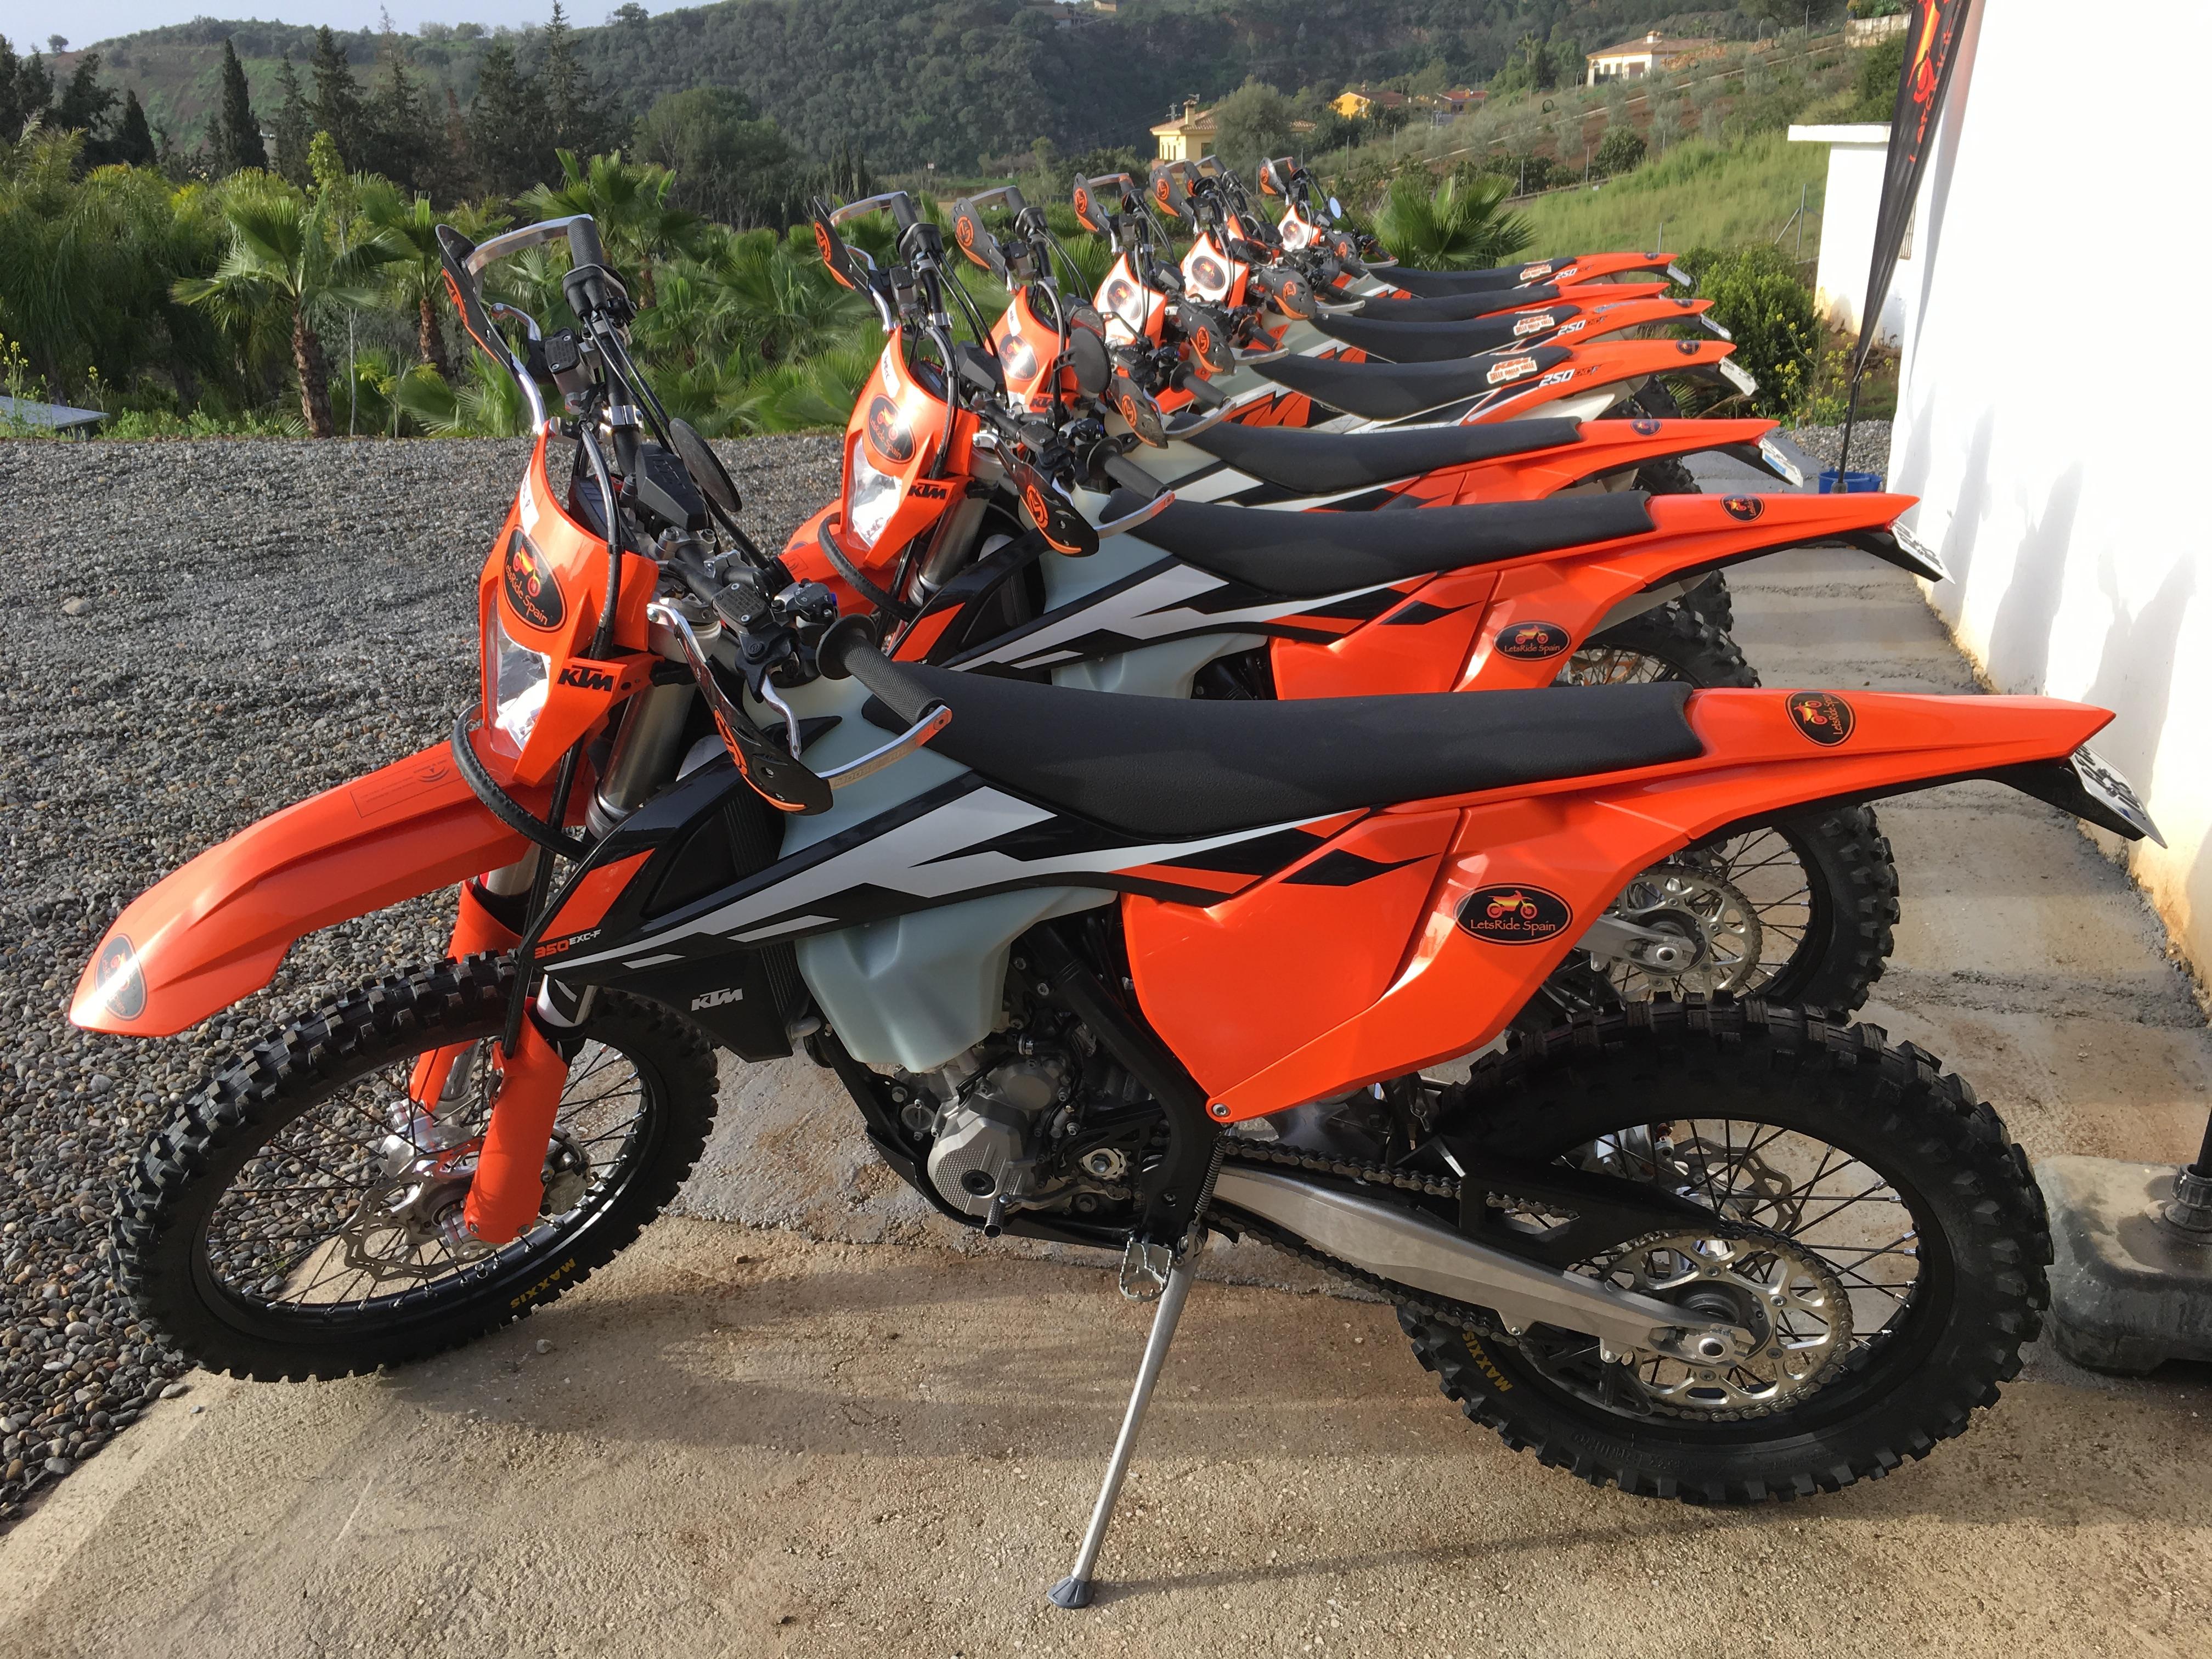 LetsRide Spain KTM Bikes